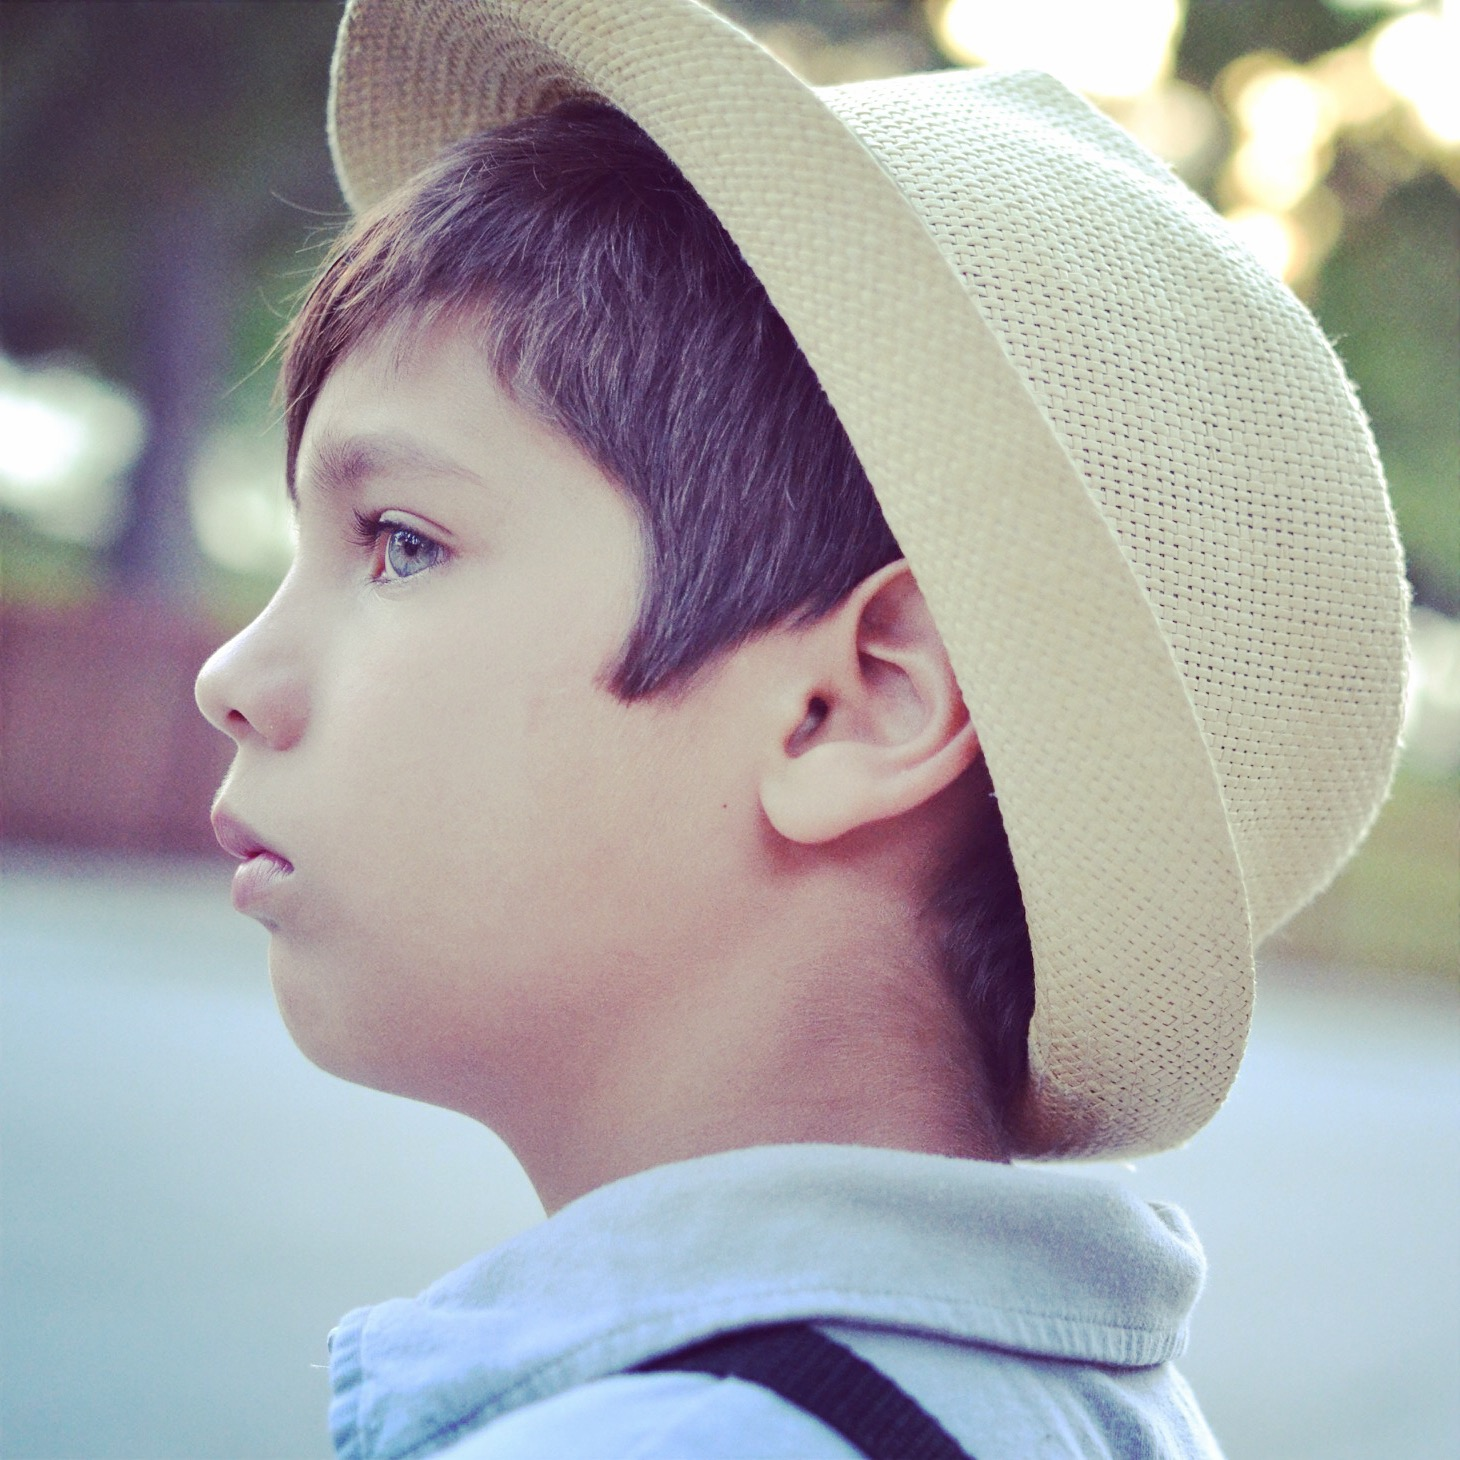 Ephraim -- age 8